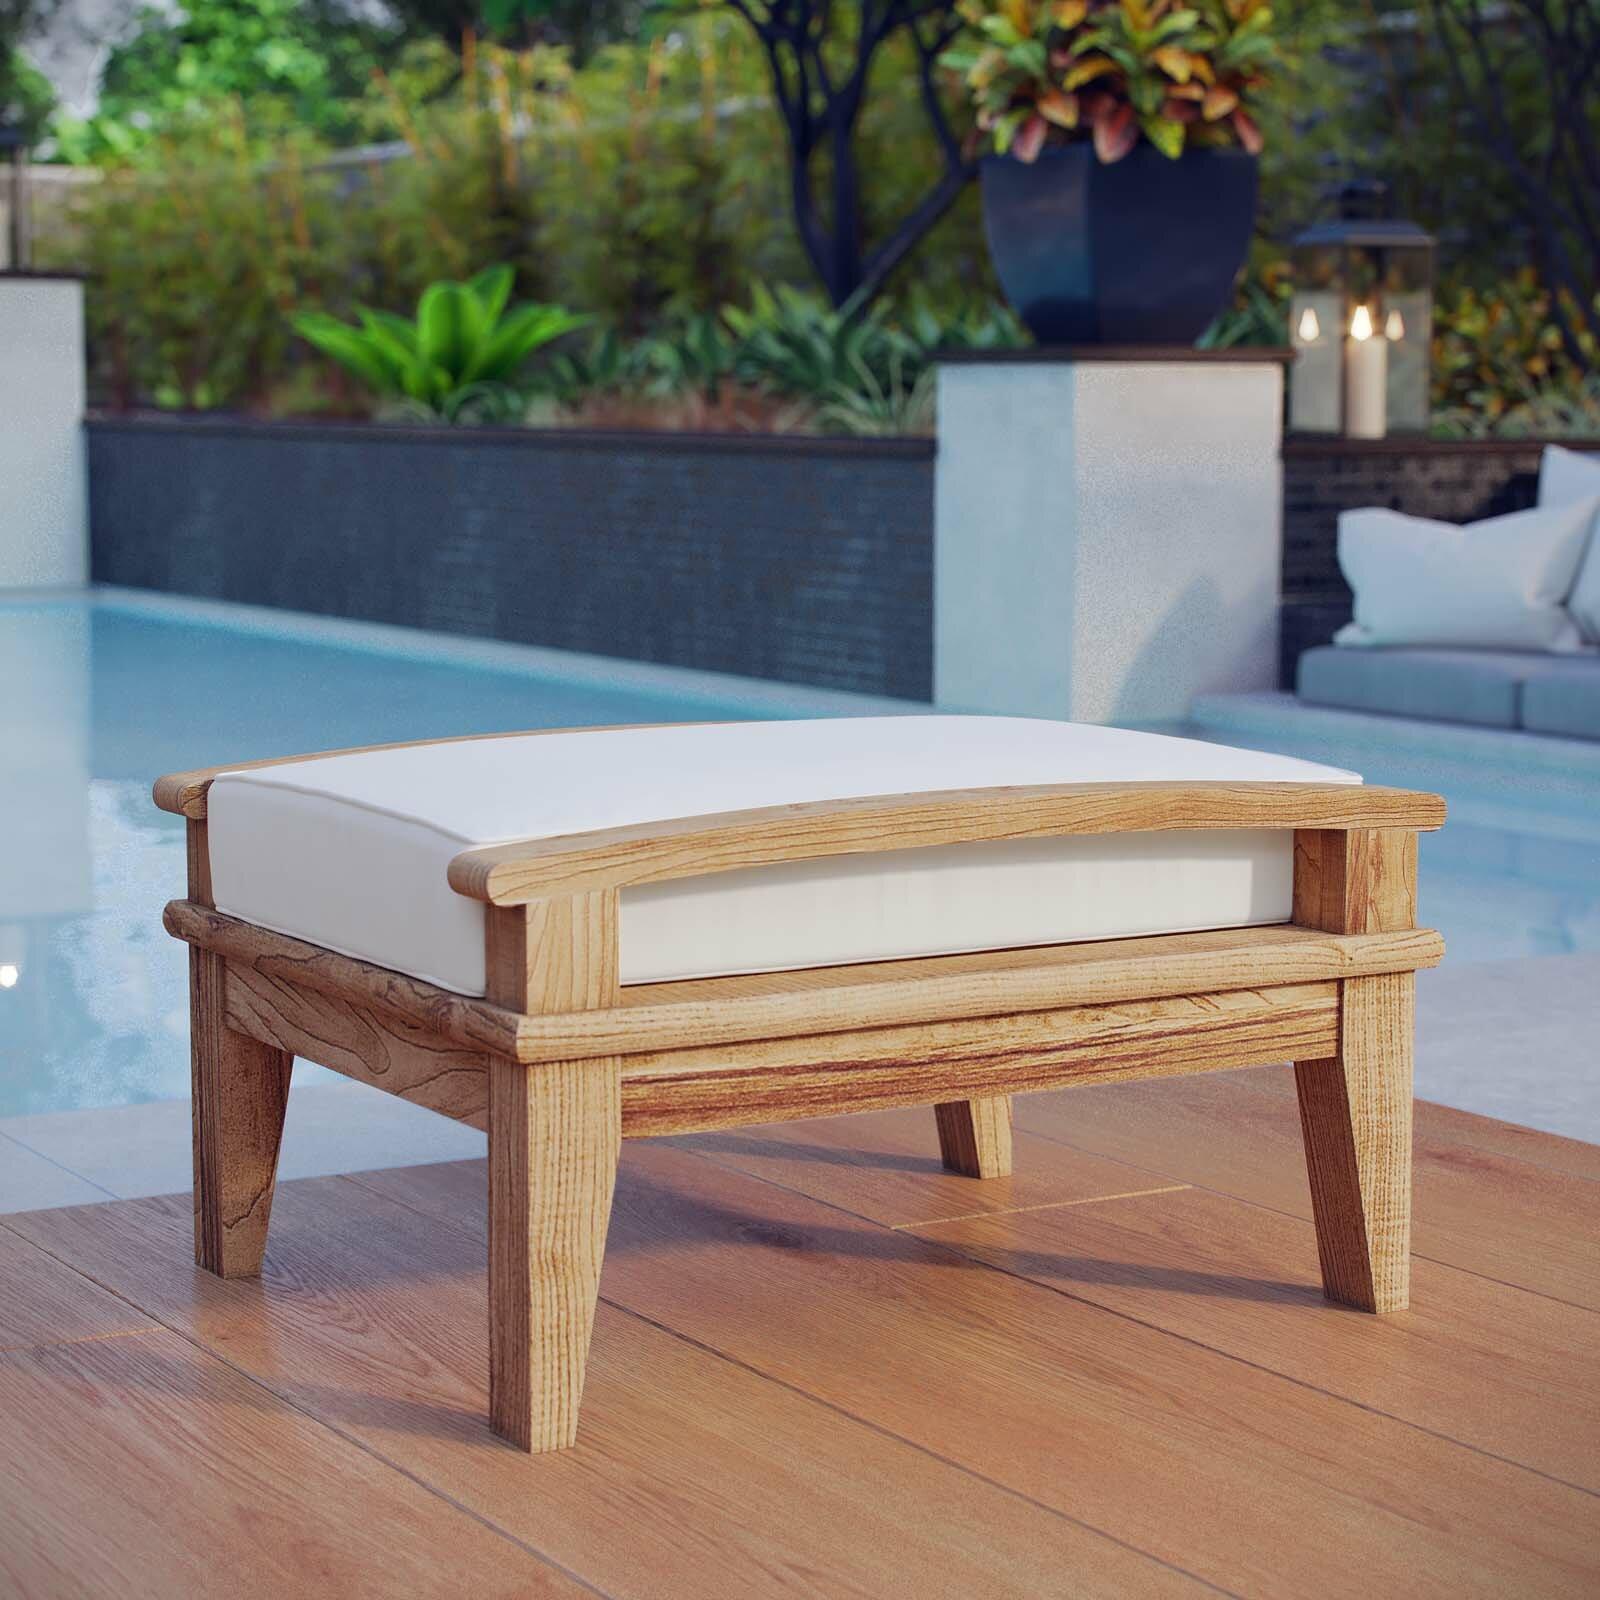 Belle Glade Outdoor Teak Ottoman With Cushion Reviews Joss Main